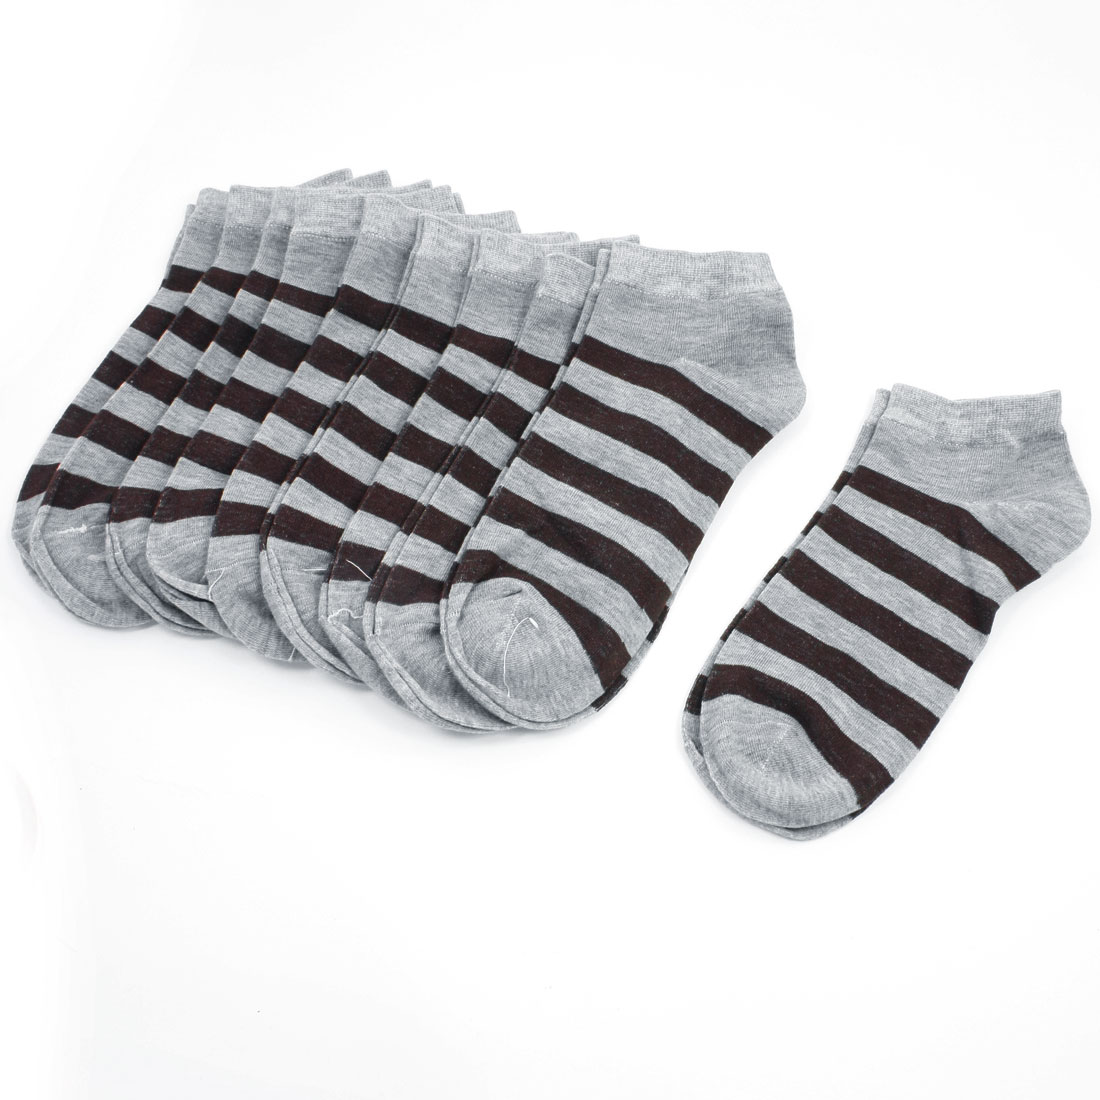 Lady Brown Stripes Pattern Short Low Cut Sports Socks Gray 10 Pairs